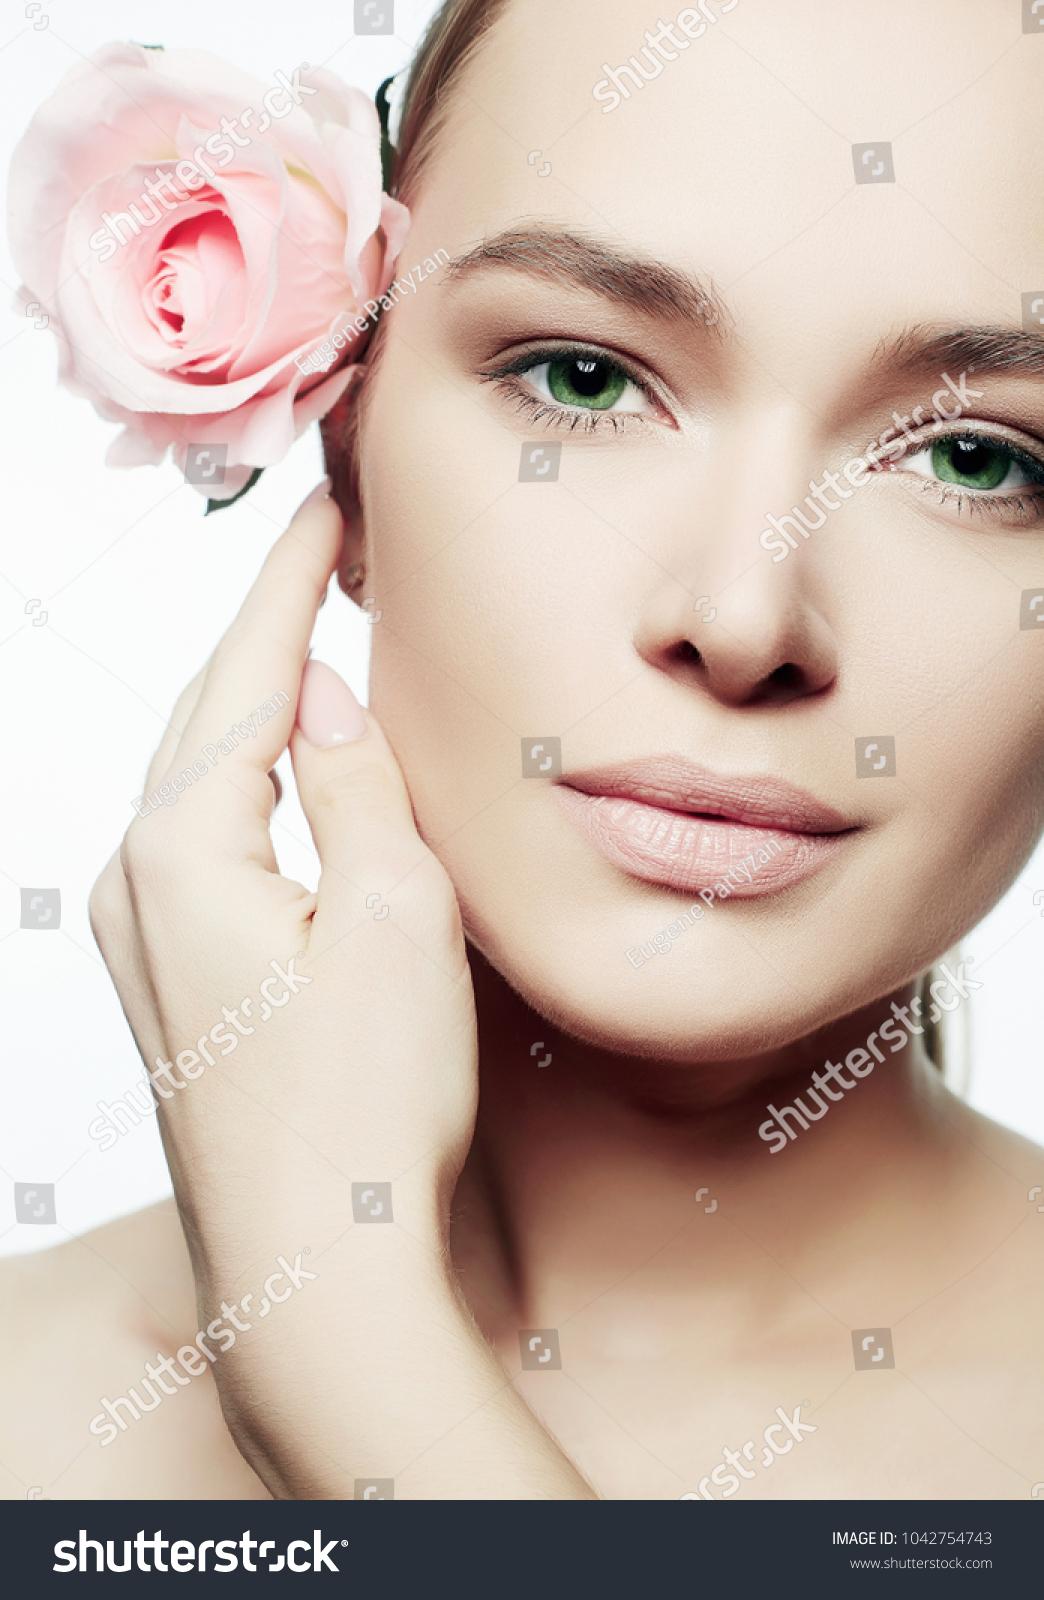 Nice flower beauty makeup sketch ball gown wedding dresses flower beauty makeup choice image flower wallpaper hd izmirmasajfo